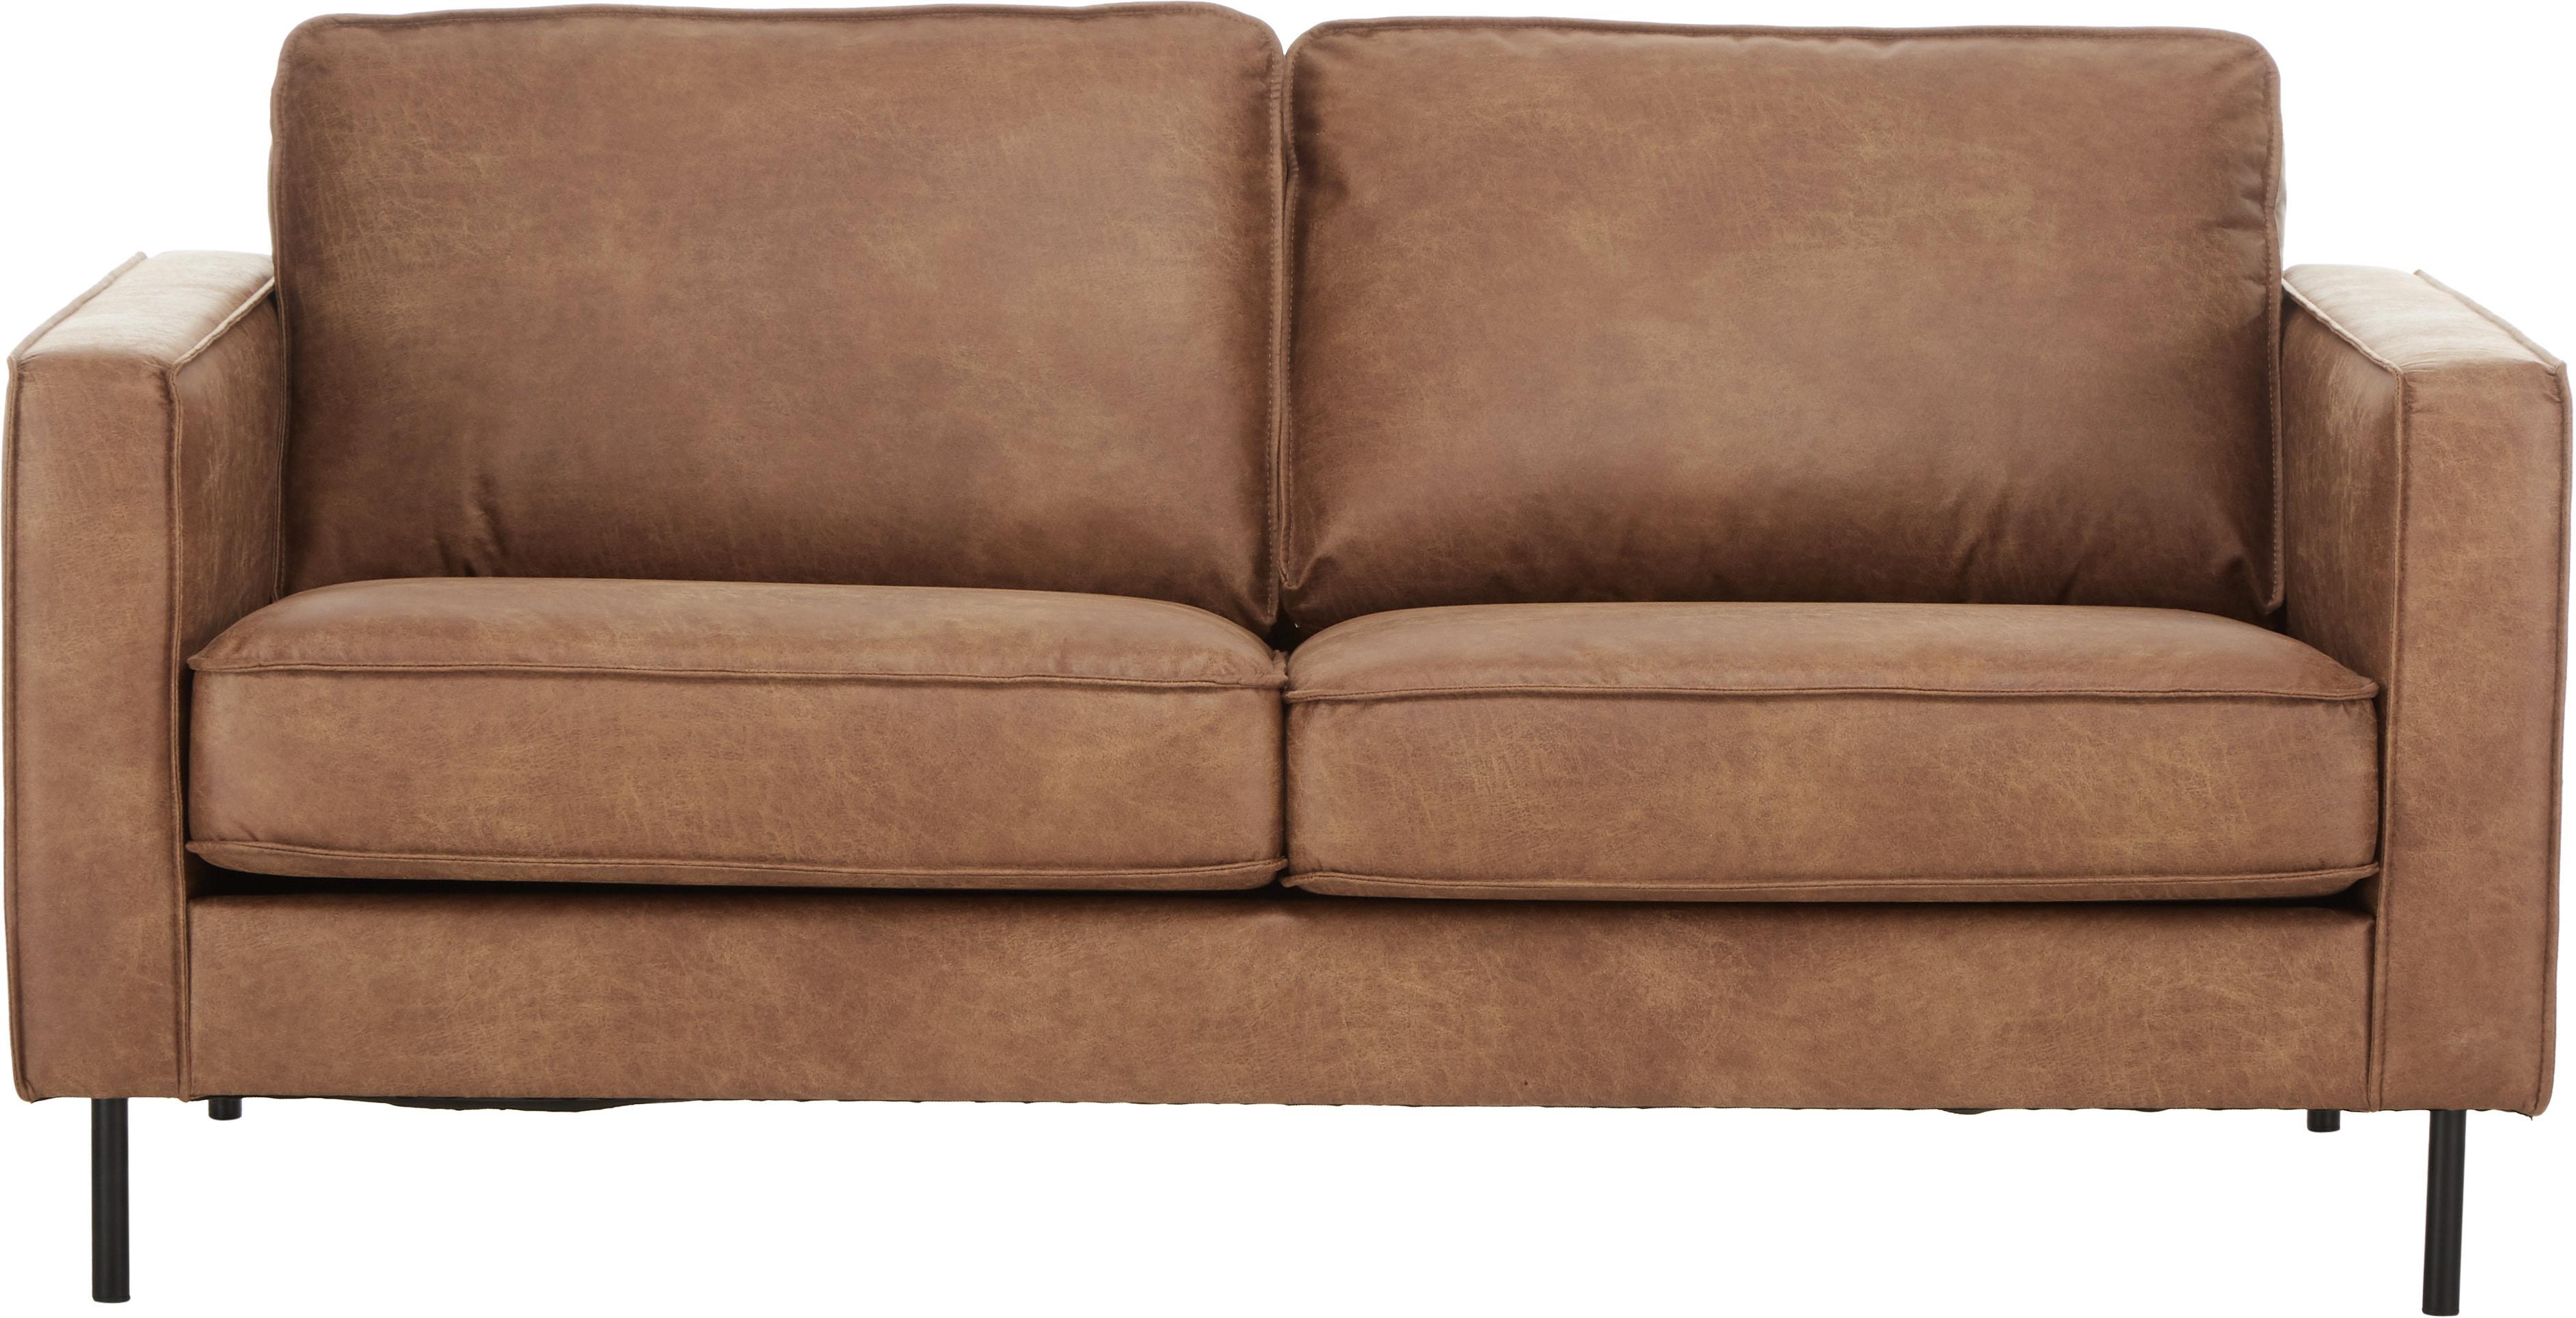 Leder-Sofa Hunter (2-Sitzer), Bezug: 70% recyceltes Leder, 30%, Gestell: Massives Birkenholz und h, Füße: Metall, pulverbeschichtet, Leder Braun, B 164 cm x T 90 cm